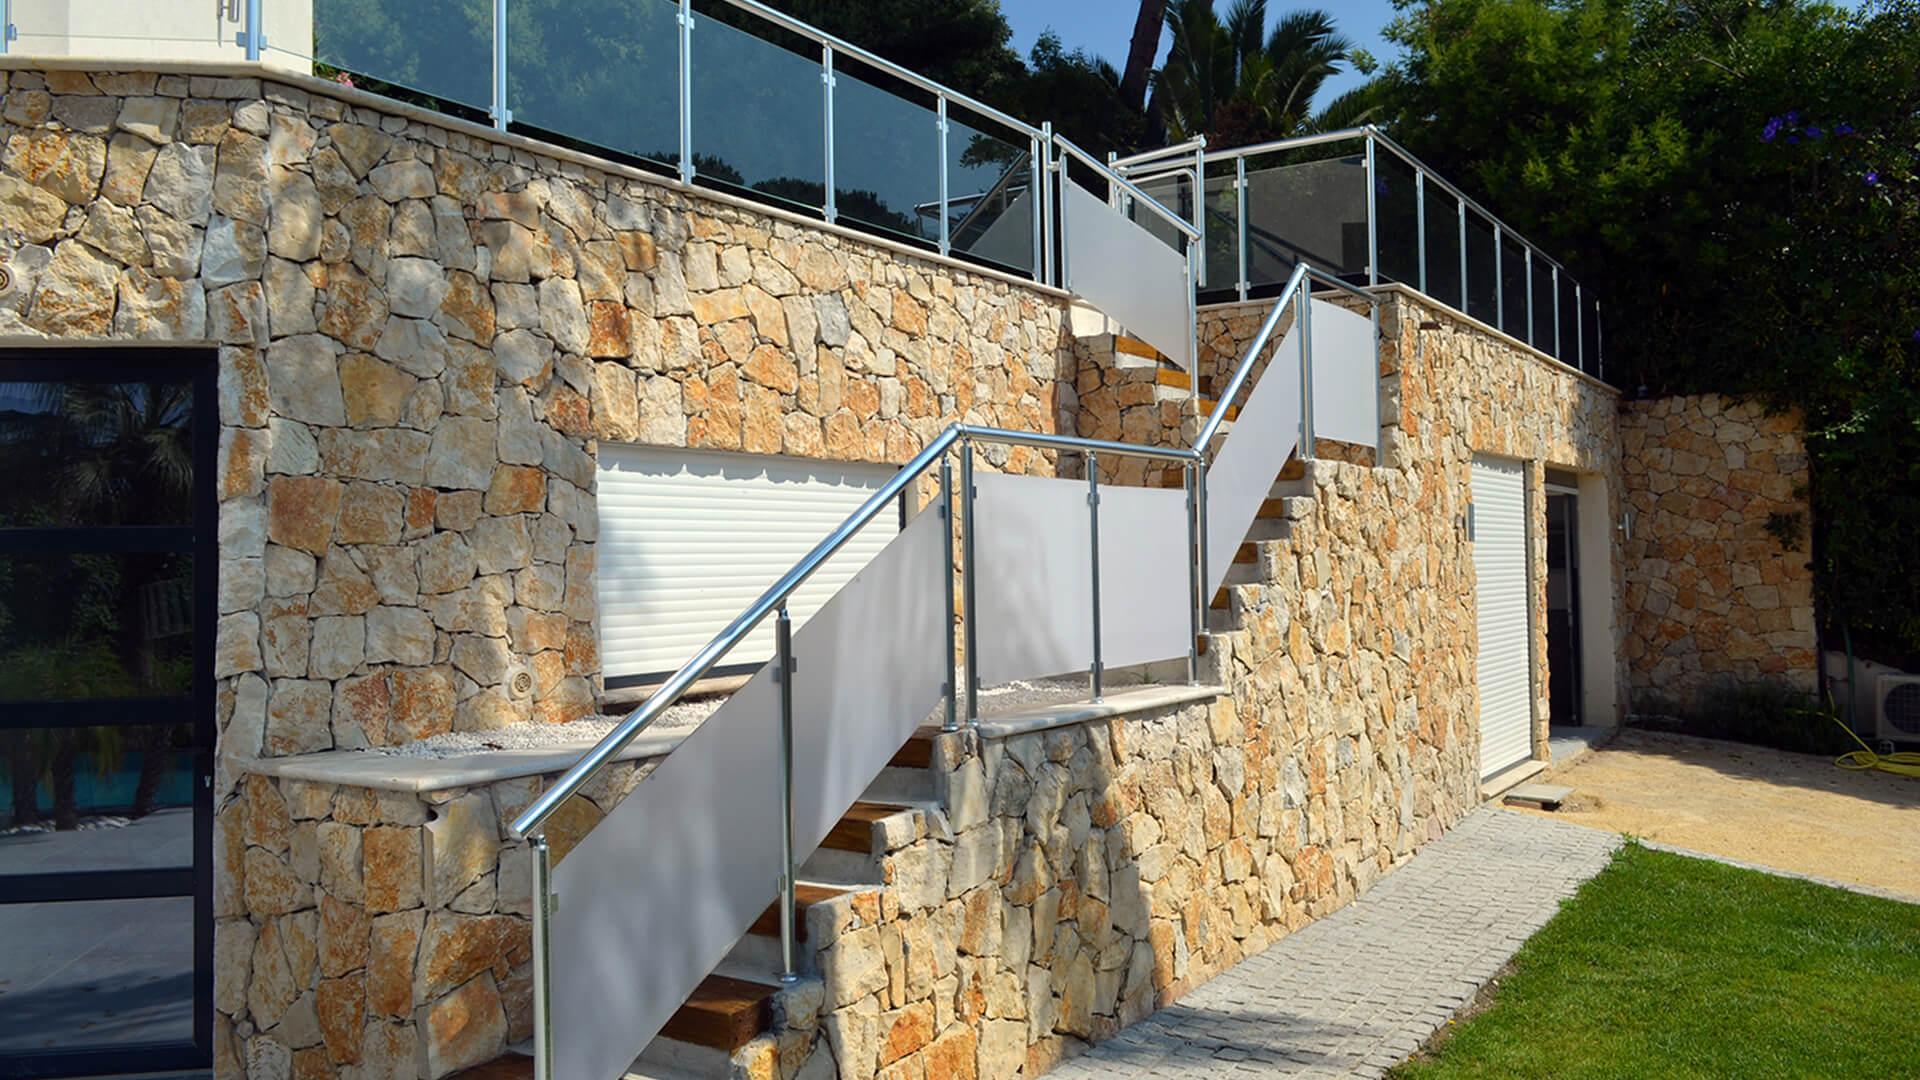 rampe d'escalier et main courante Rampe d'escaliers en alu & verre Rampe d'escaliers en alu & verre